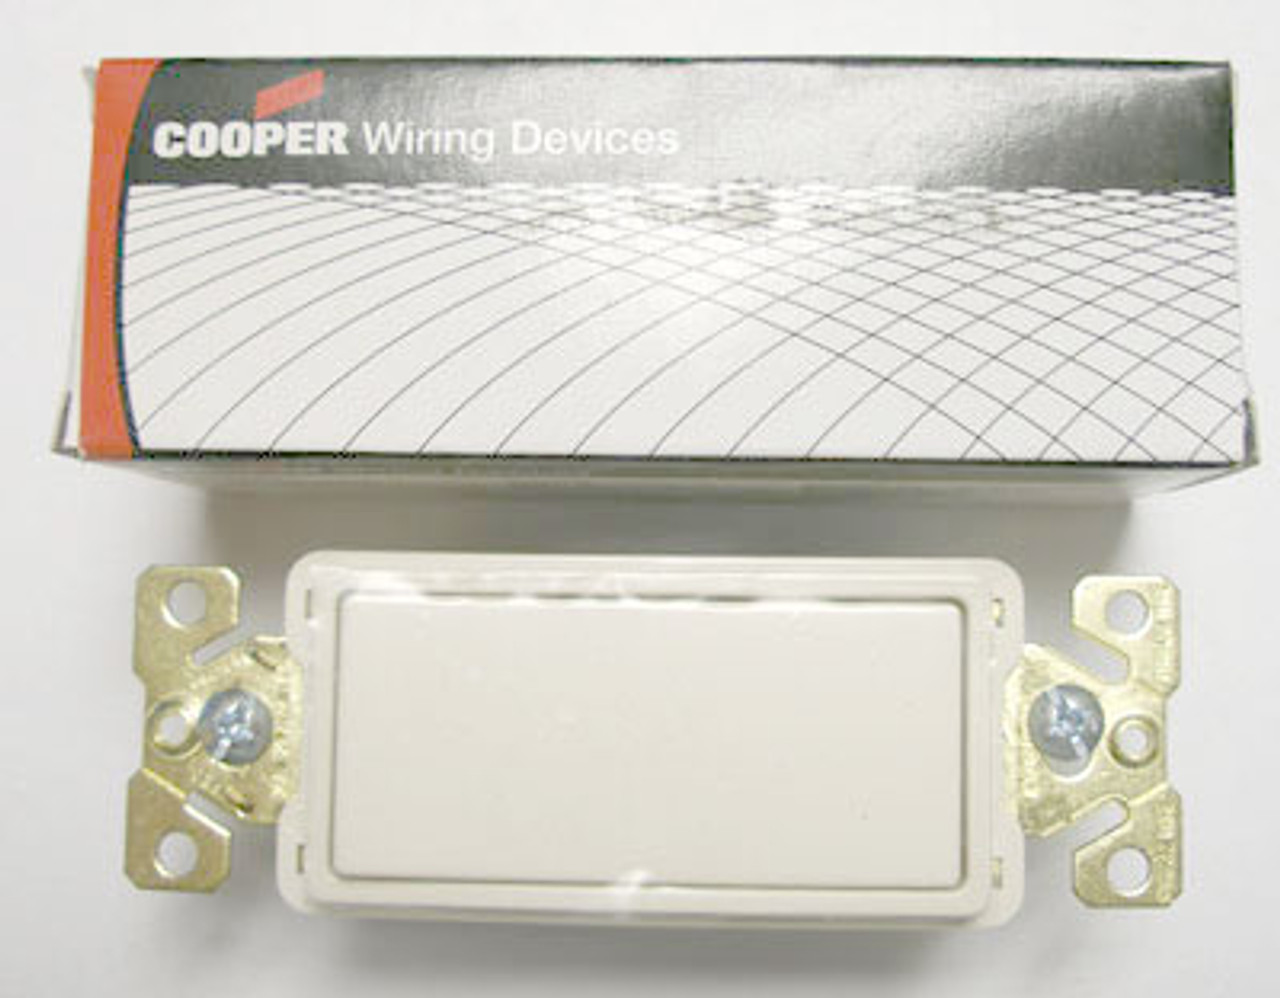 Cooper 7623LA Light Almond Decorator Commercial Switch - New